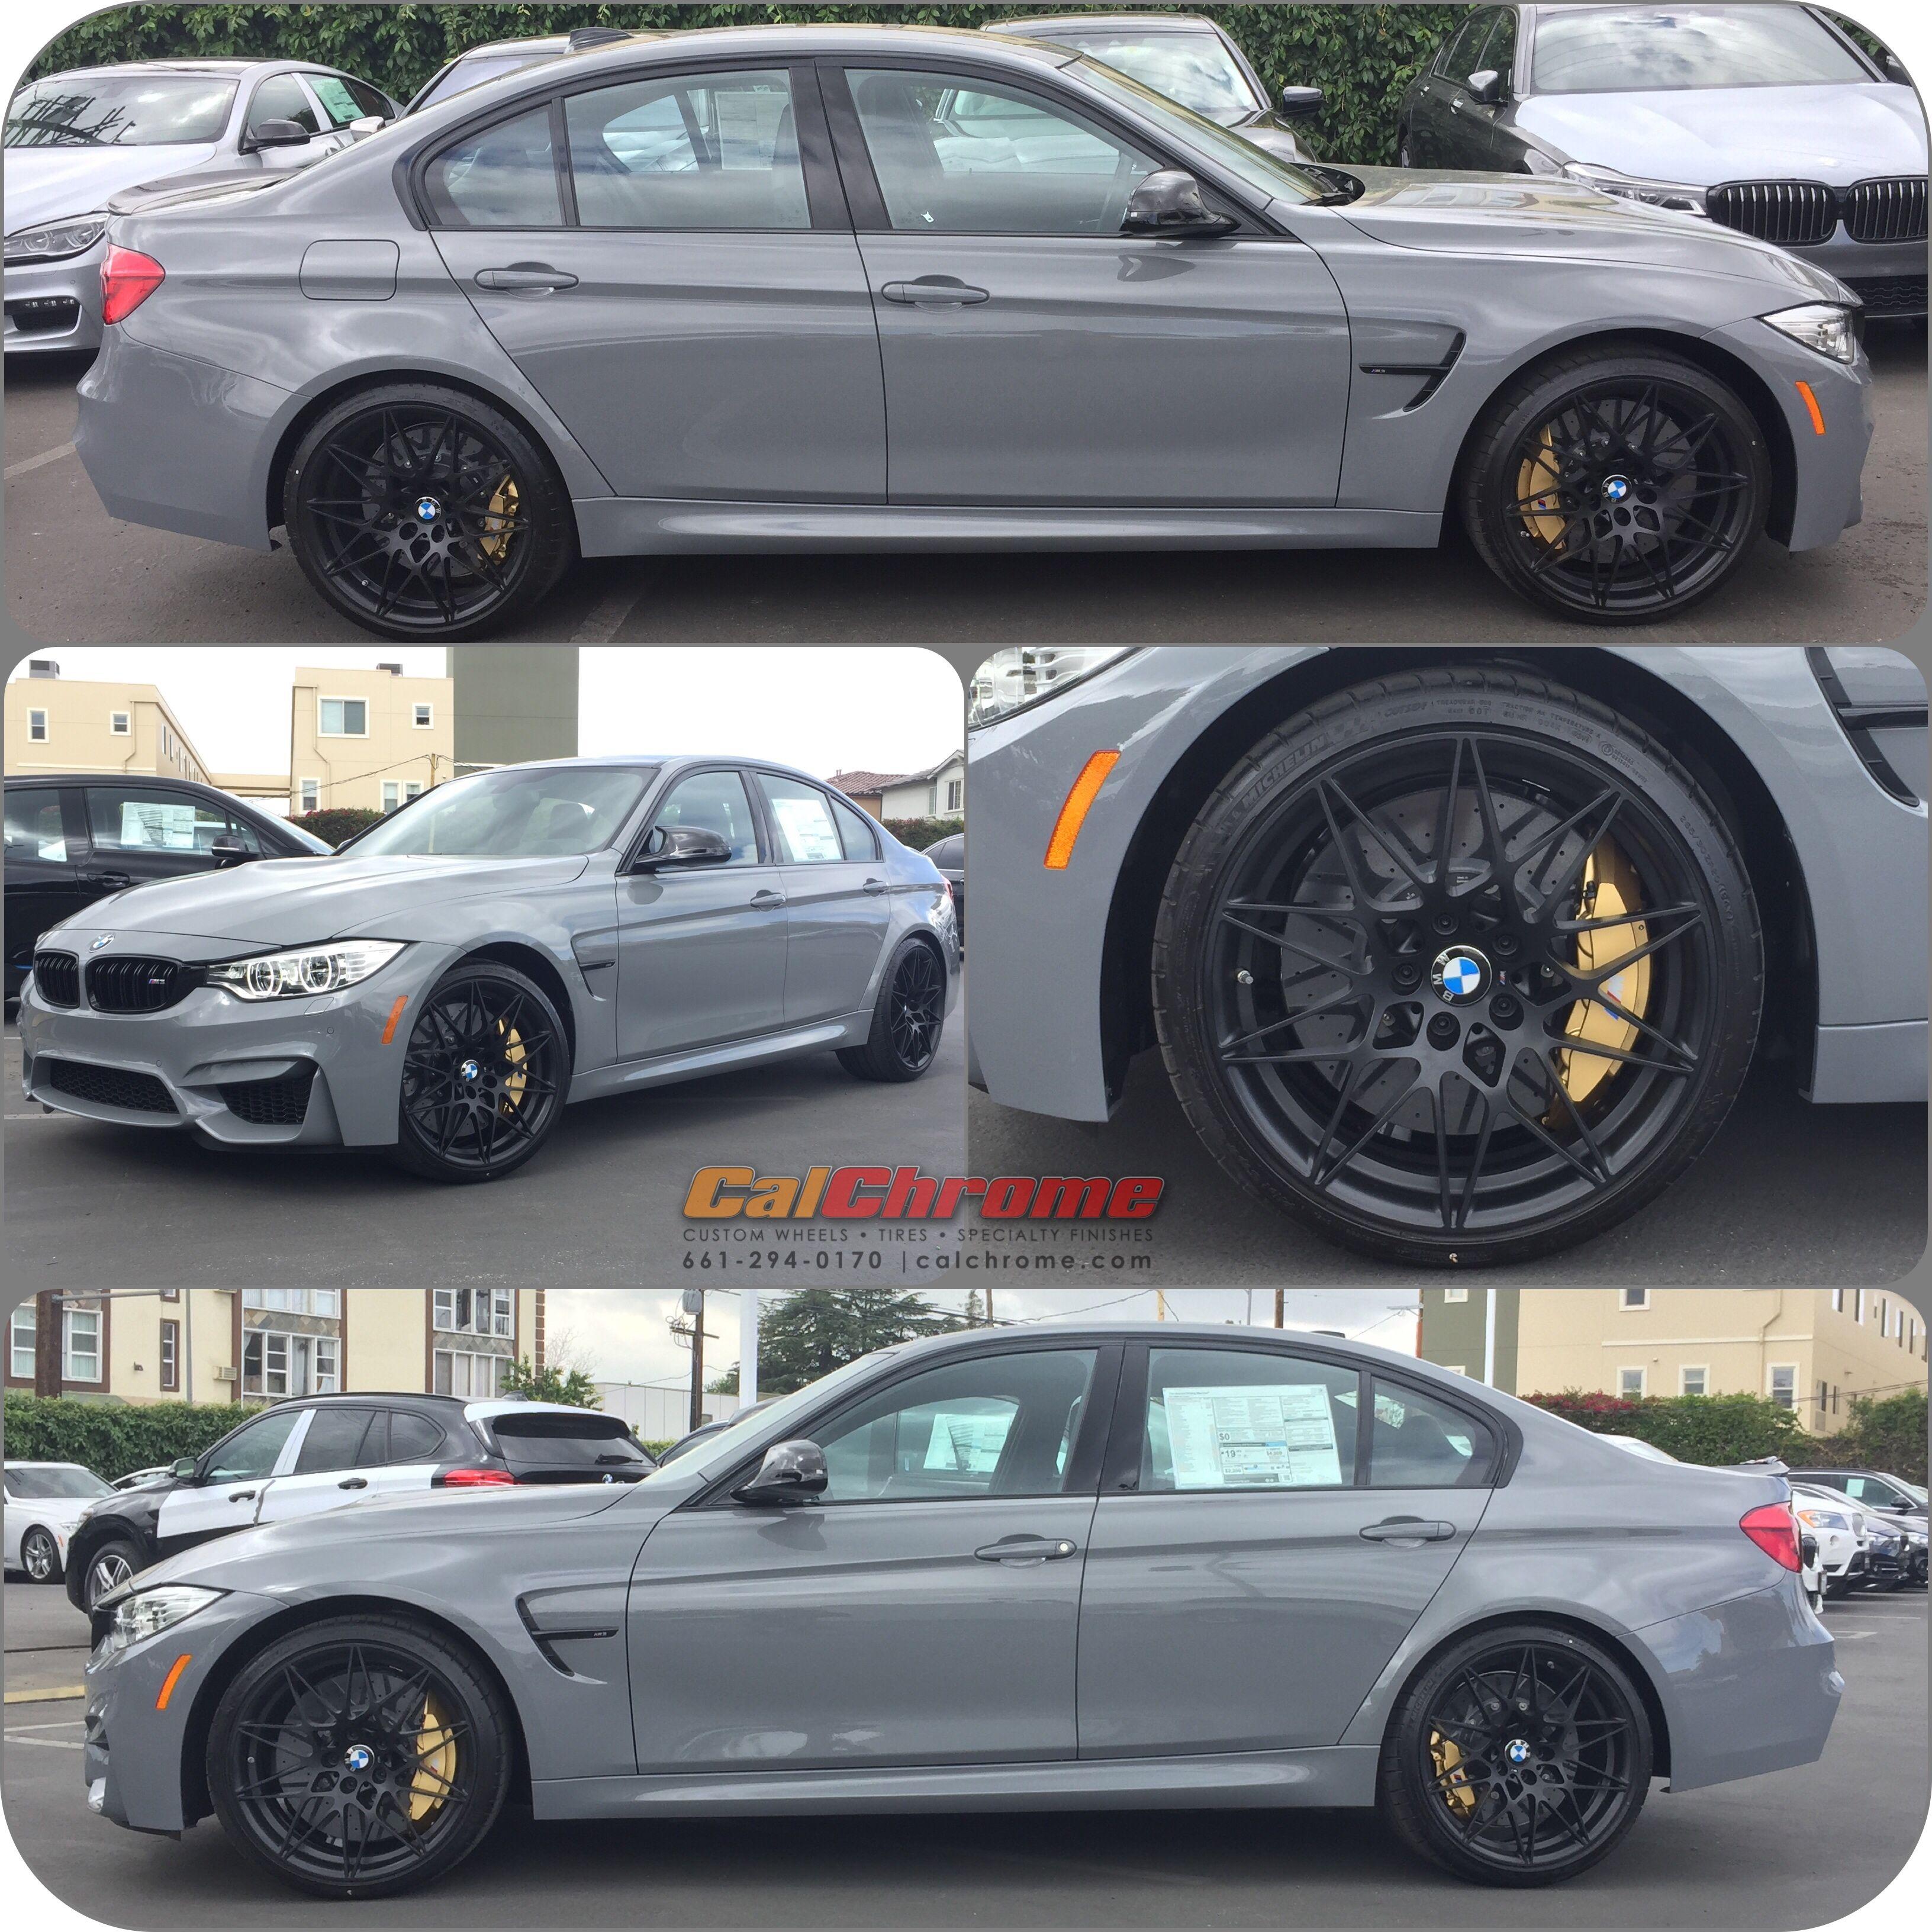 2017 Bmw M3: 2017 BMW M3 With Style 666 In Matte Black Fusion Powder